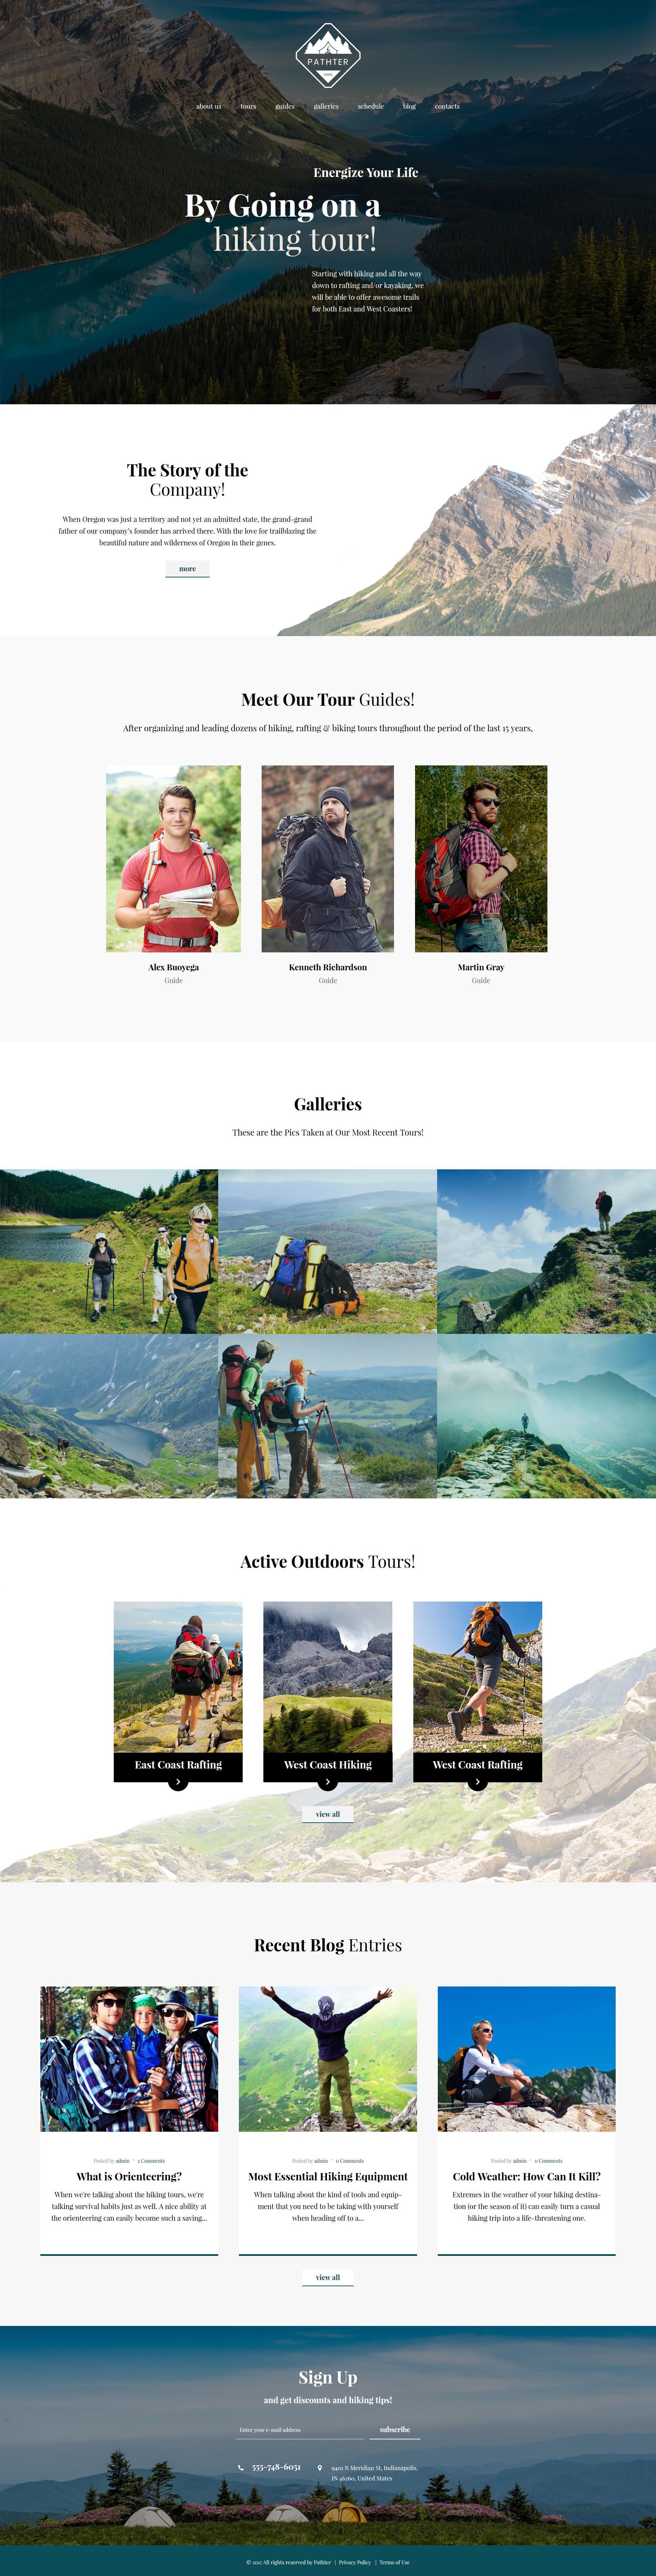 """Hiking & Camping Tours"" - адаптивний WordPress шаблон №62388 - скріншот"